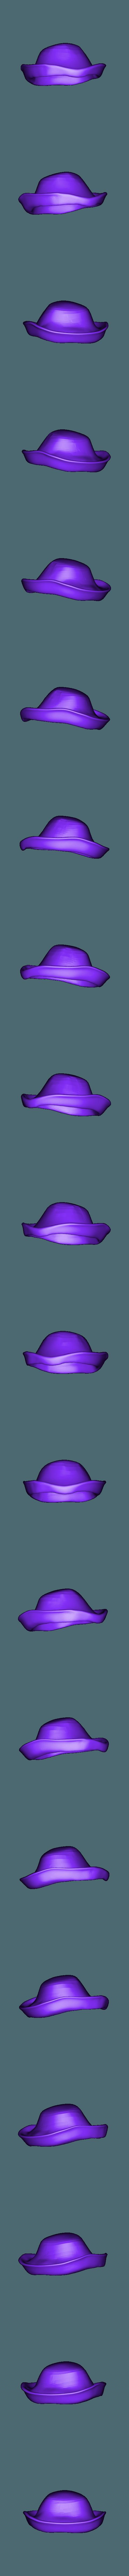 hat.stl Download free STL file Mr. Potato Head [Toy Story] • 3D printer template, Dream_it_Model_it